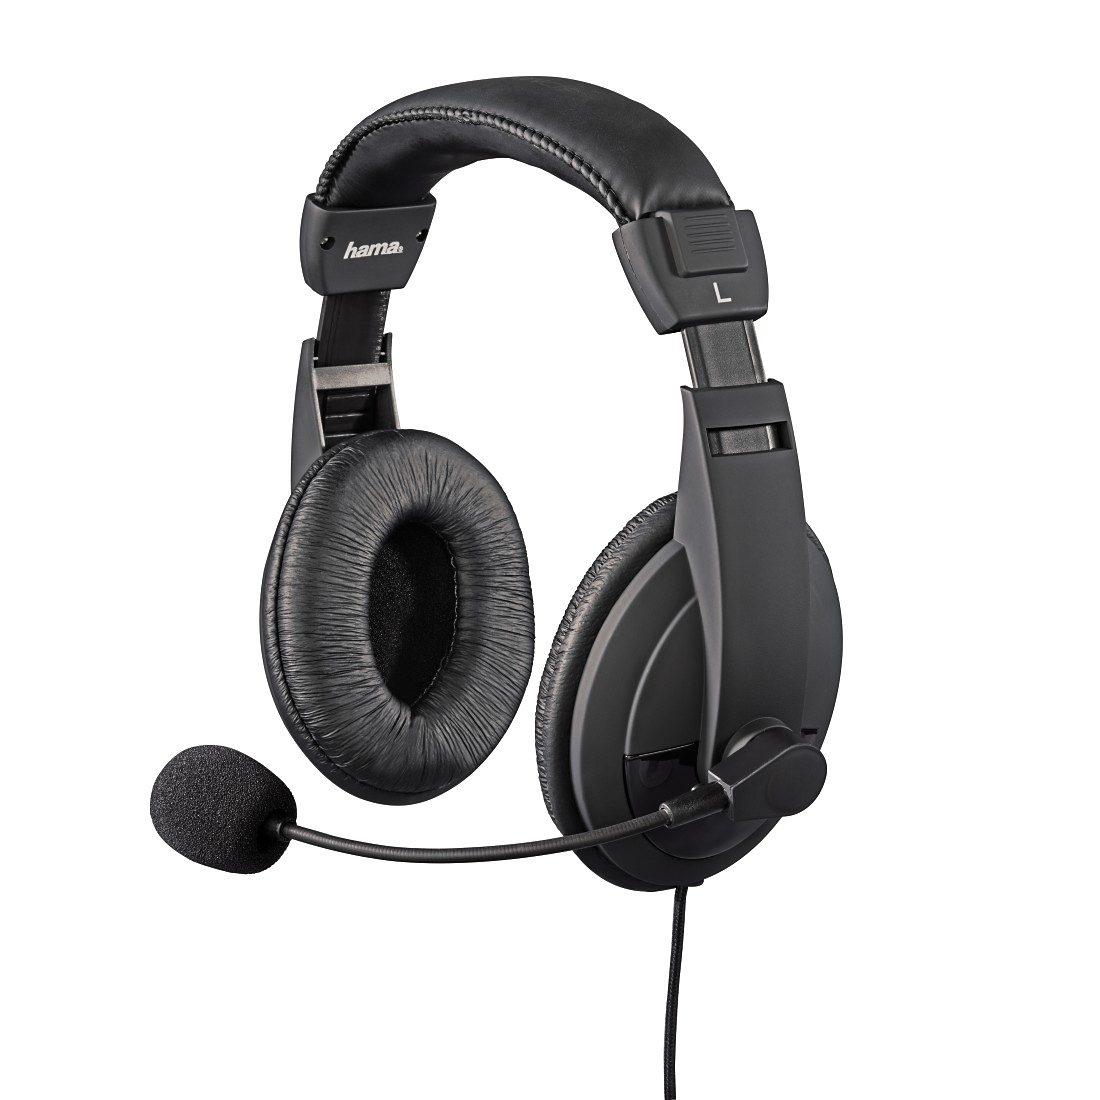 Hama Gaming Headset für PS4/PS4 Pro/PS4 Slim Over-Ear Overhead »Insomnia Coal Kopfhörer Klinke«